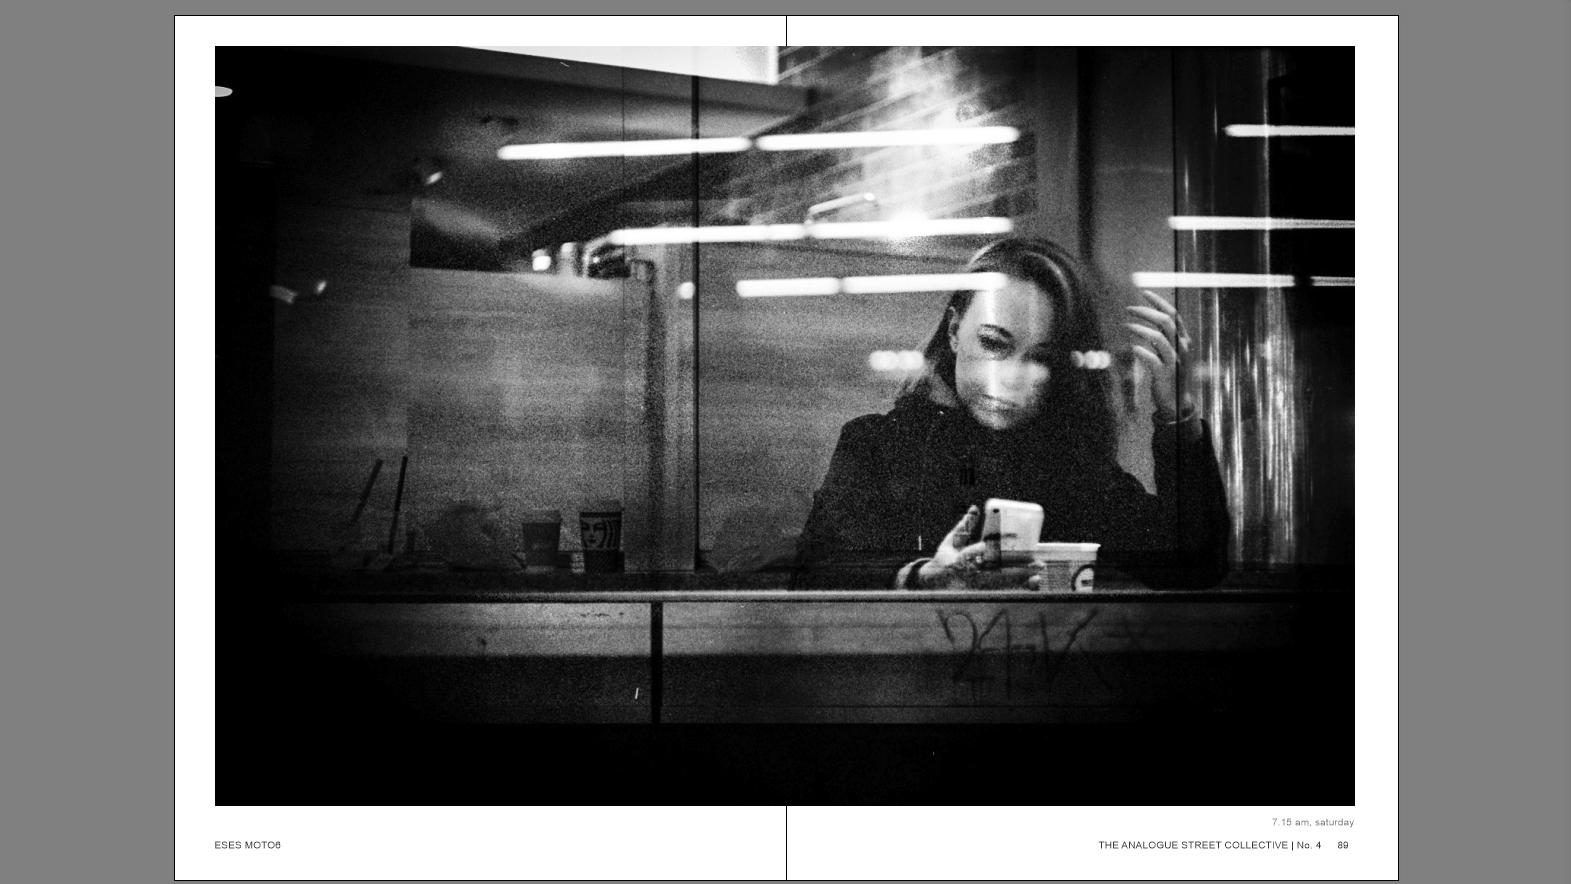 screen shots. mag 4 -09.9